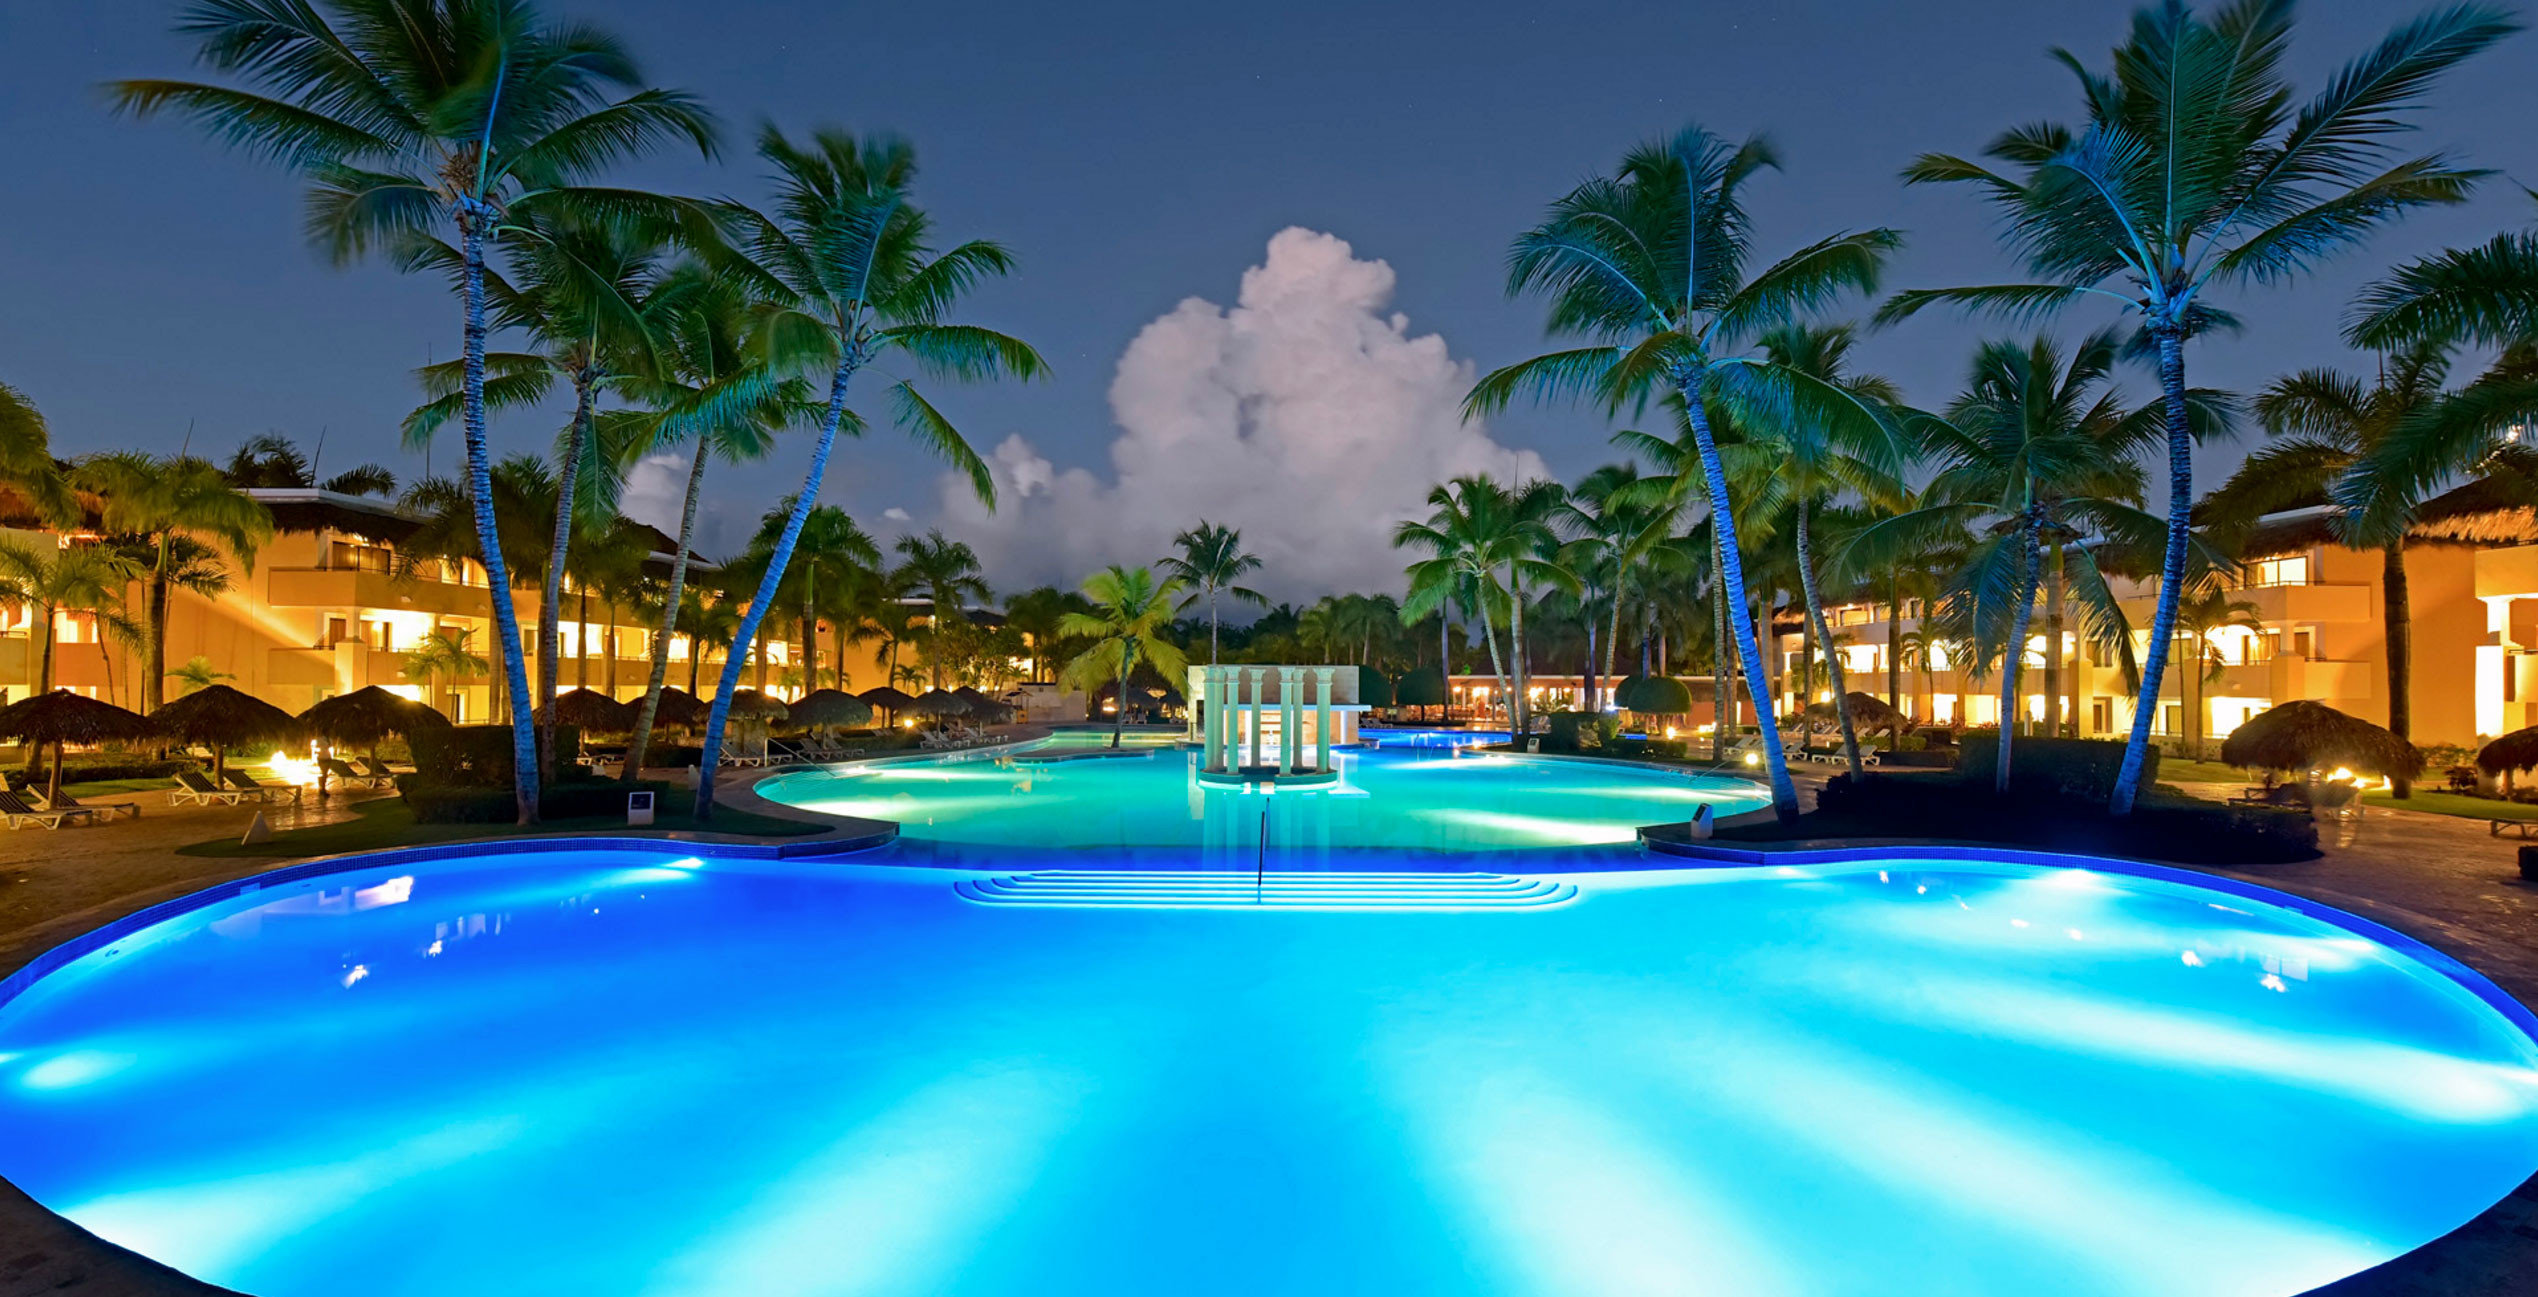 tree palm swimming pool Resort leisure caribbean Pool resort town condominium arecales blue